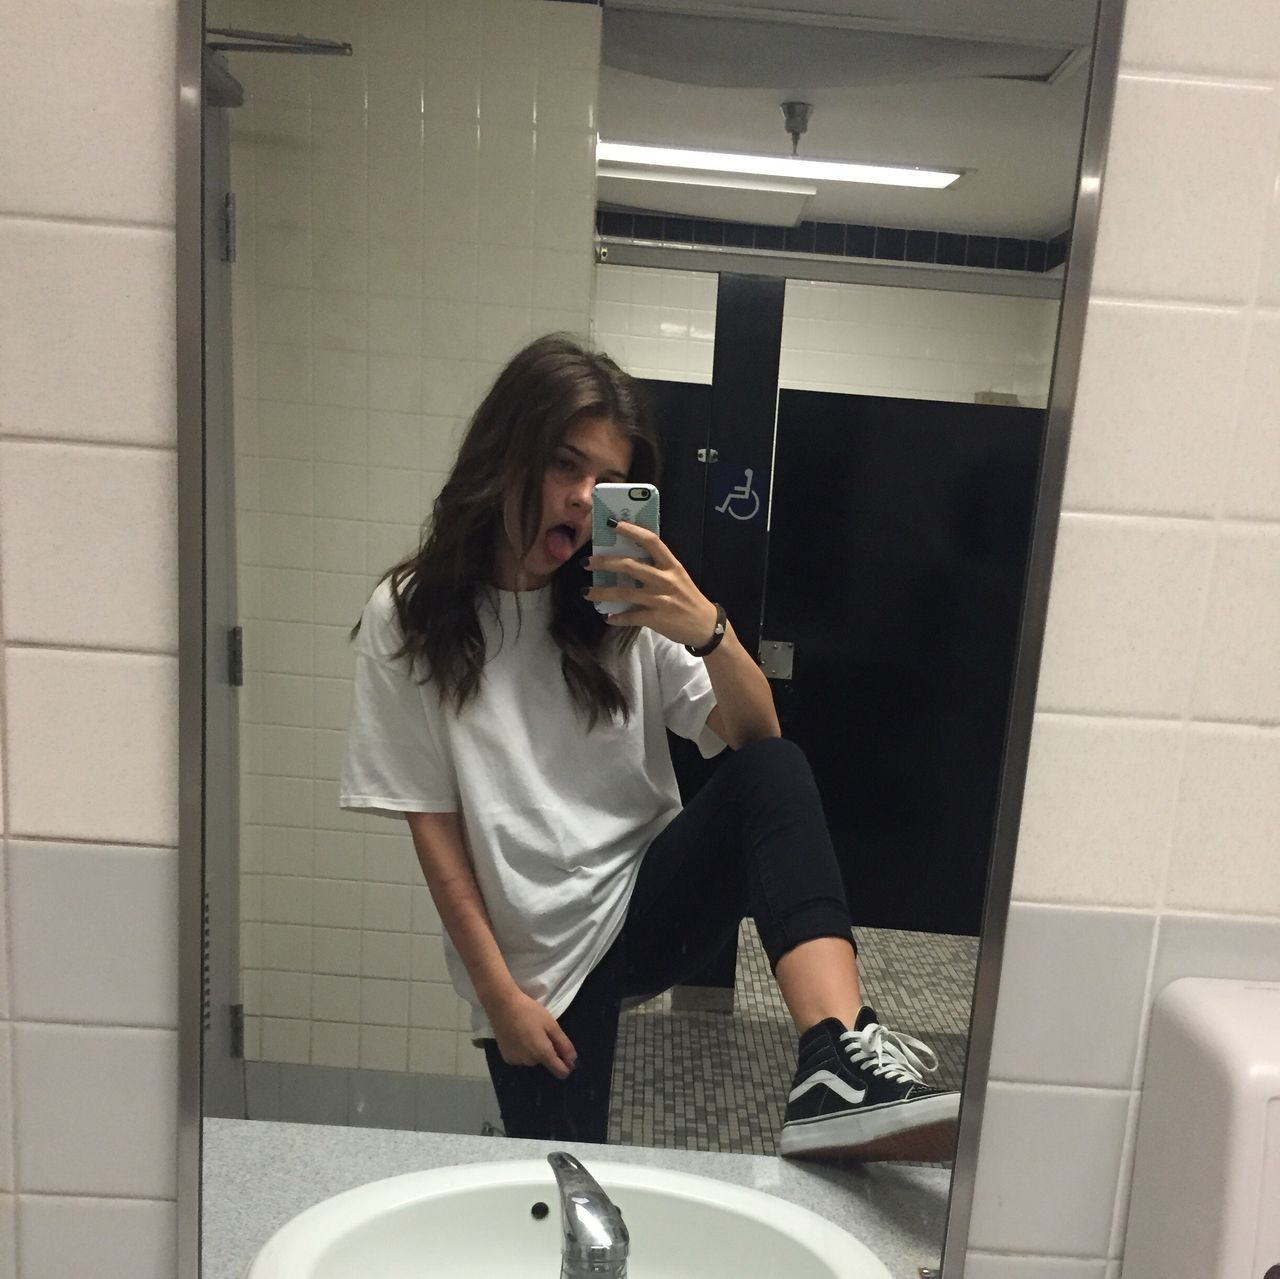 Bathroom Mirror Selfies Tumblr - Wonderful Interior Design ...